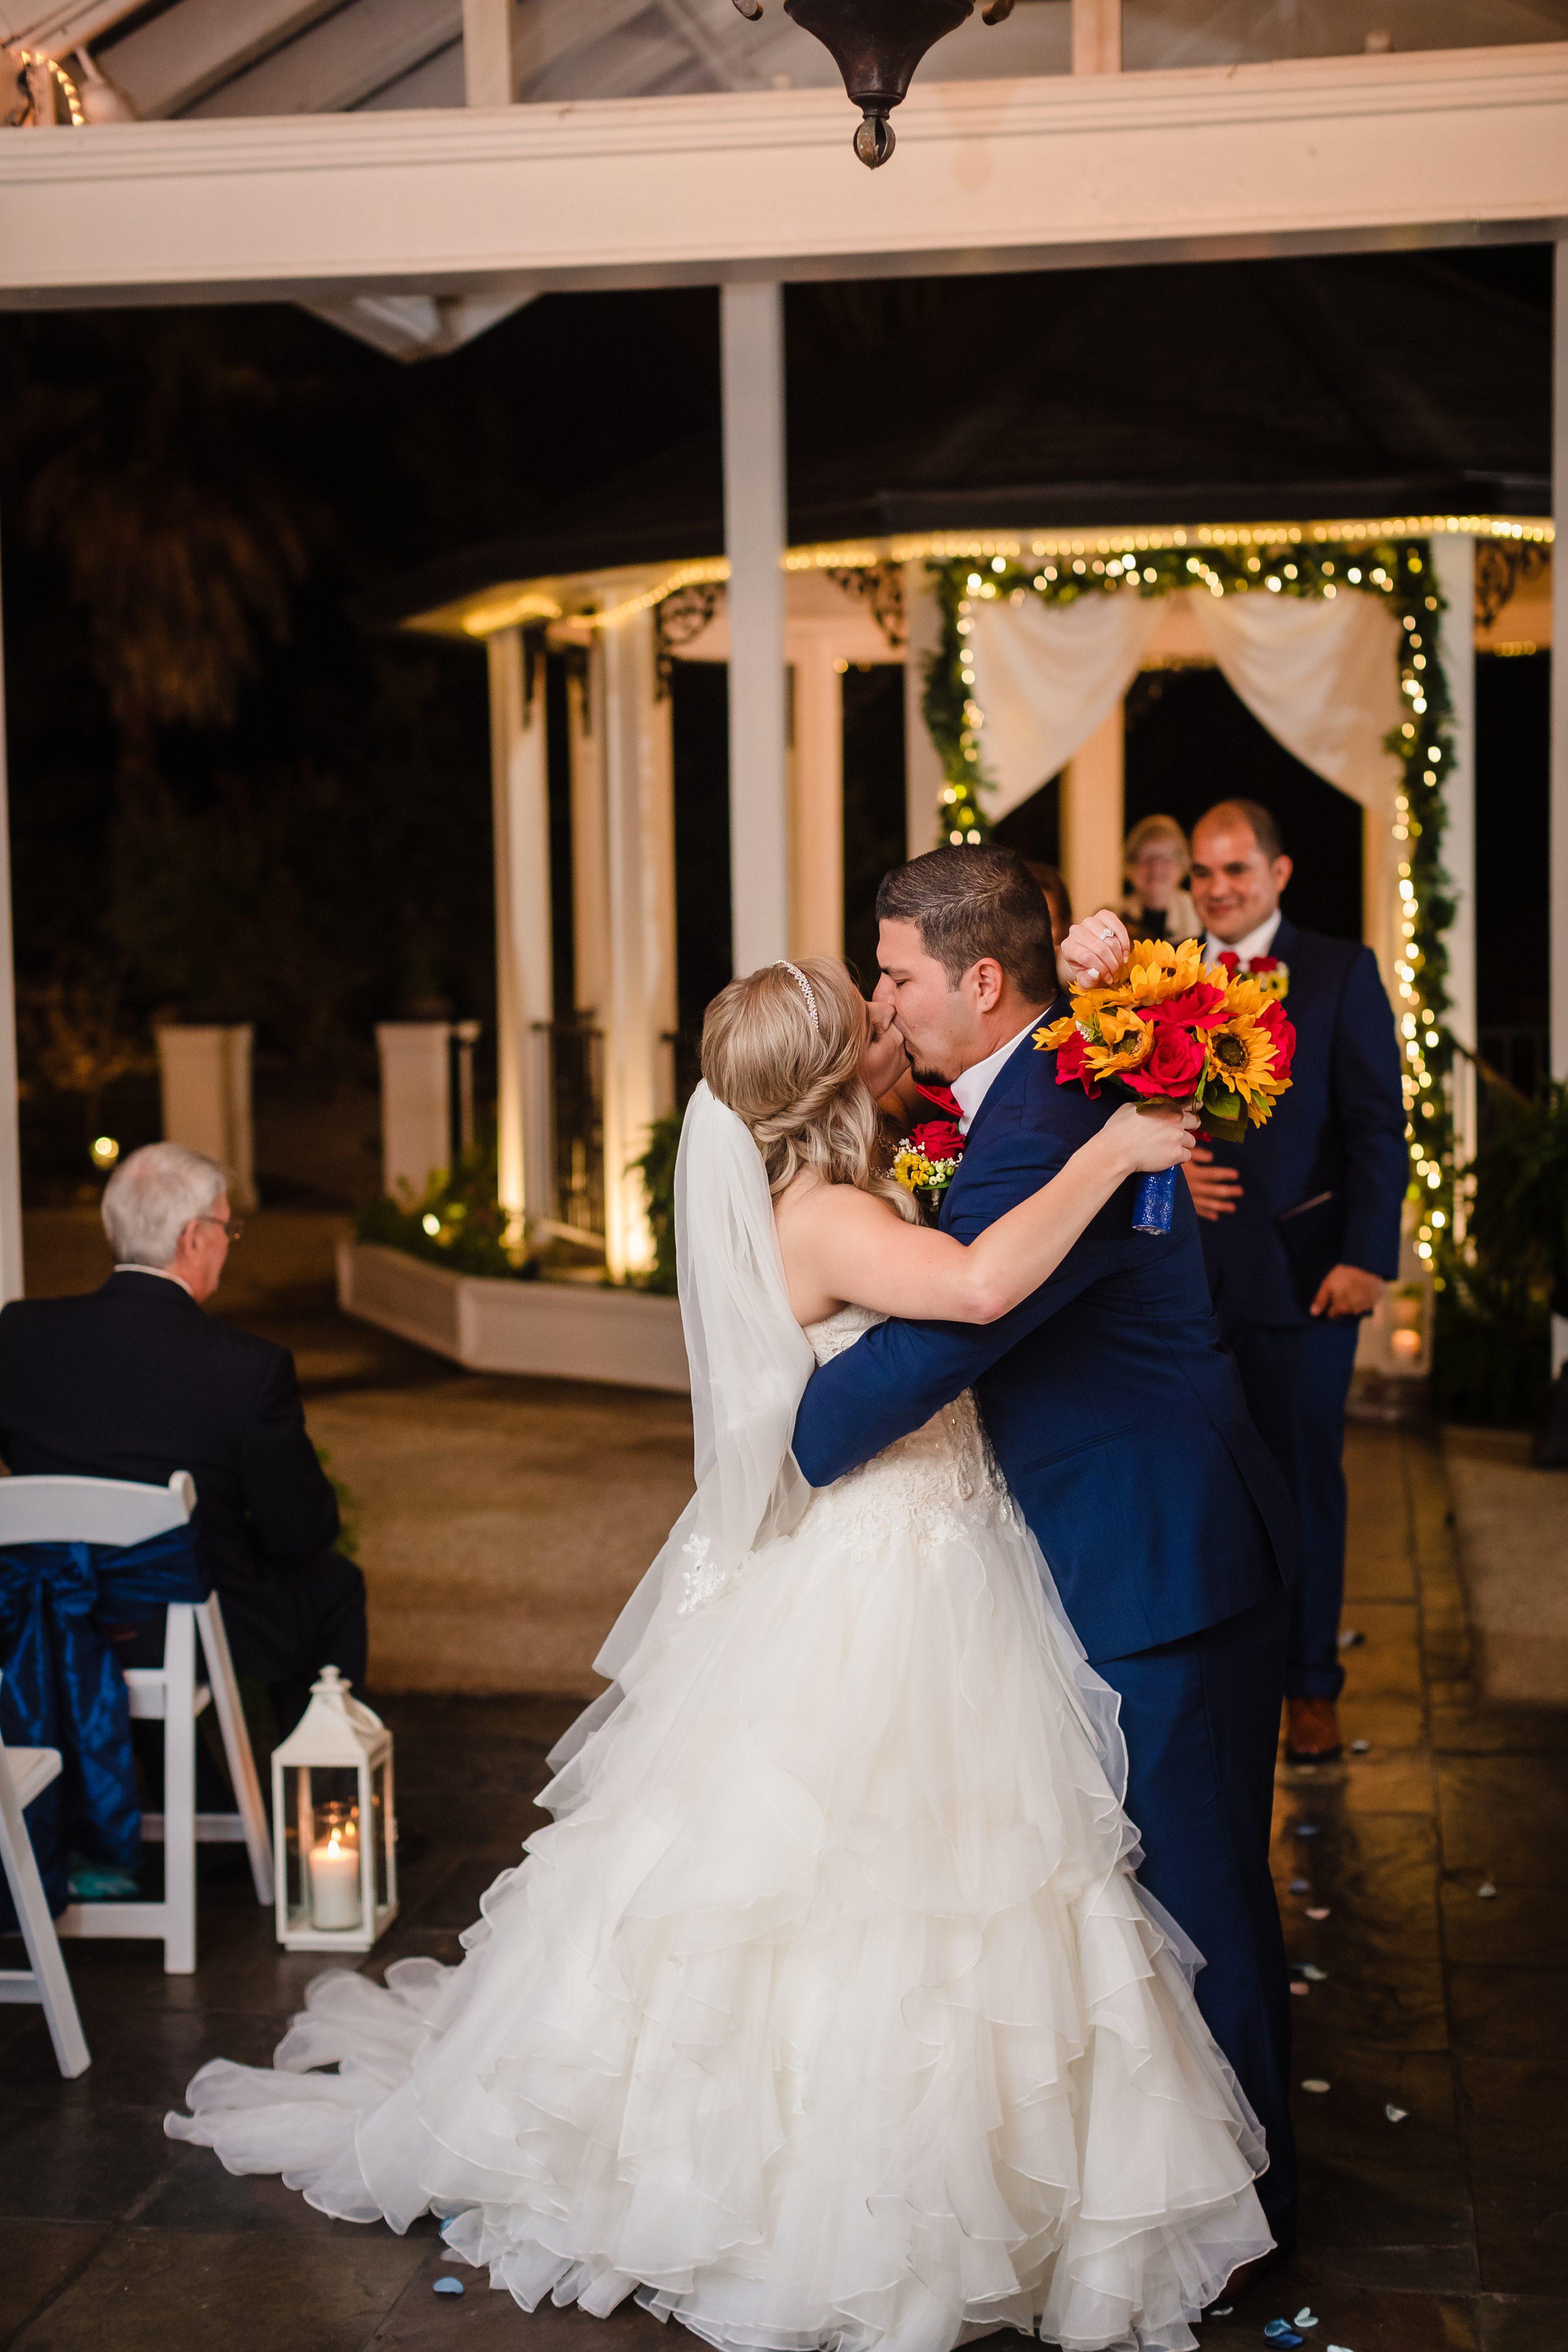 Baton Rouge Photographer, Baton Rouge wedding photographer